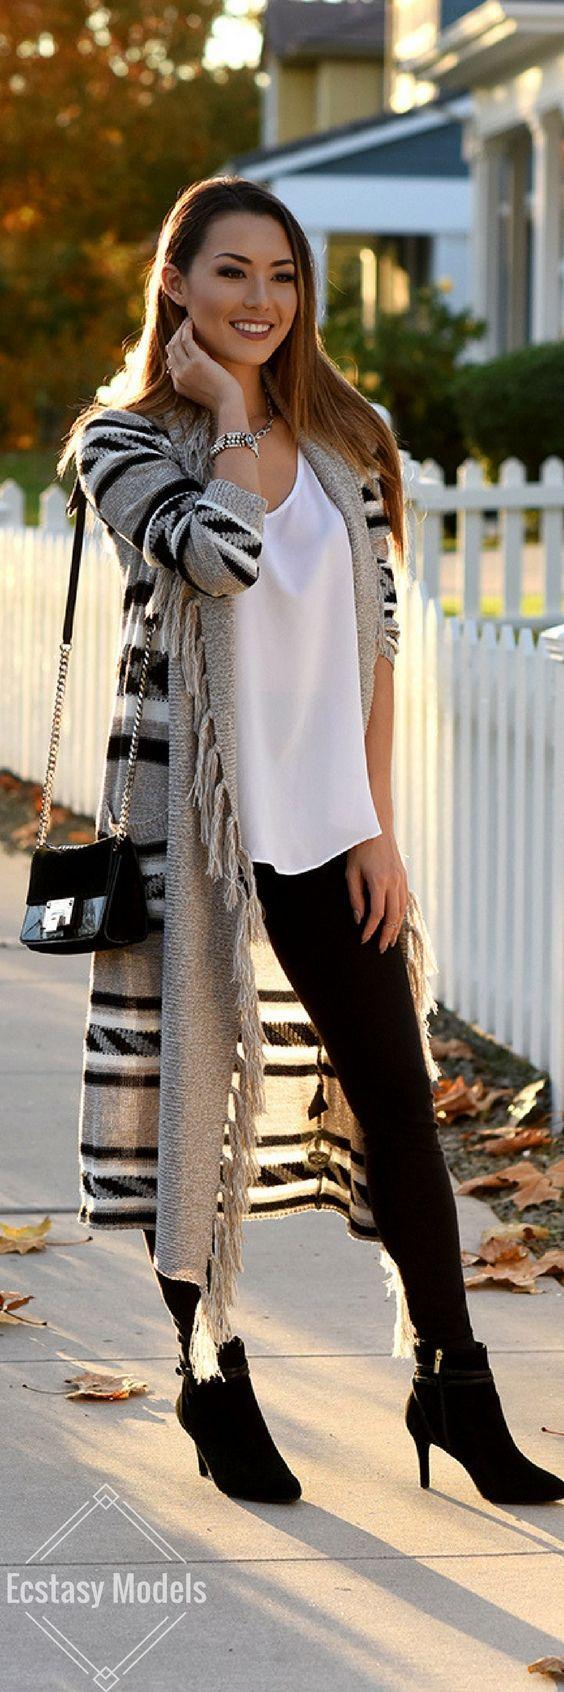 Cozy Cardigan Look // Fashion Look by Jessica Ricks